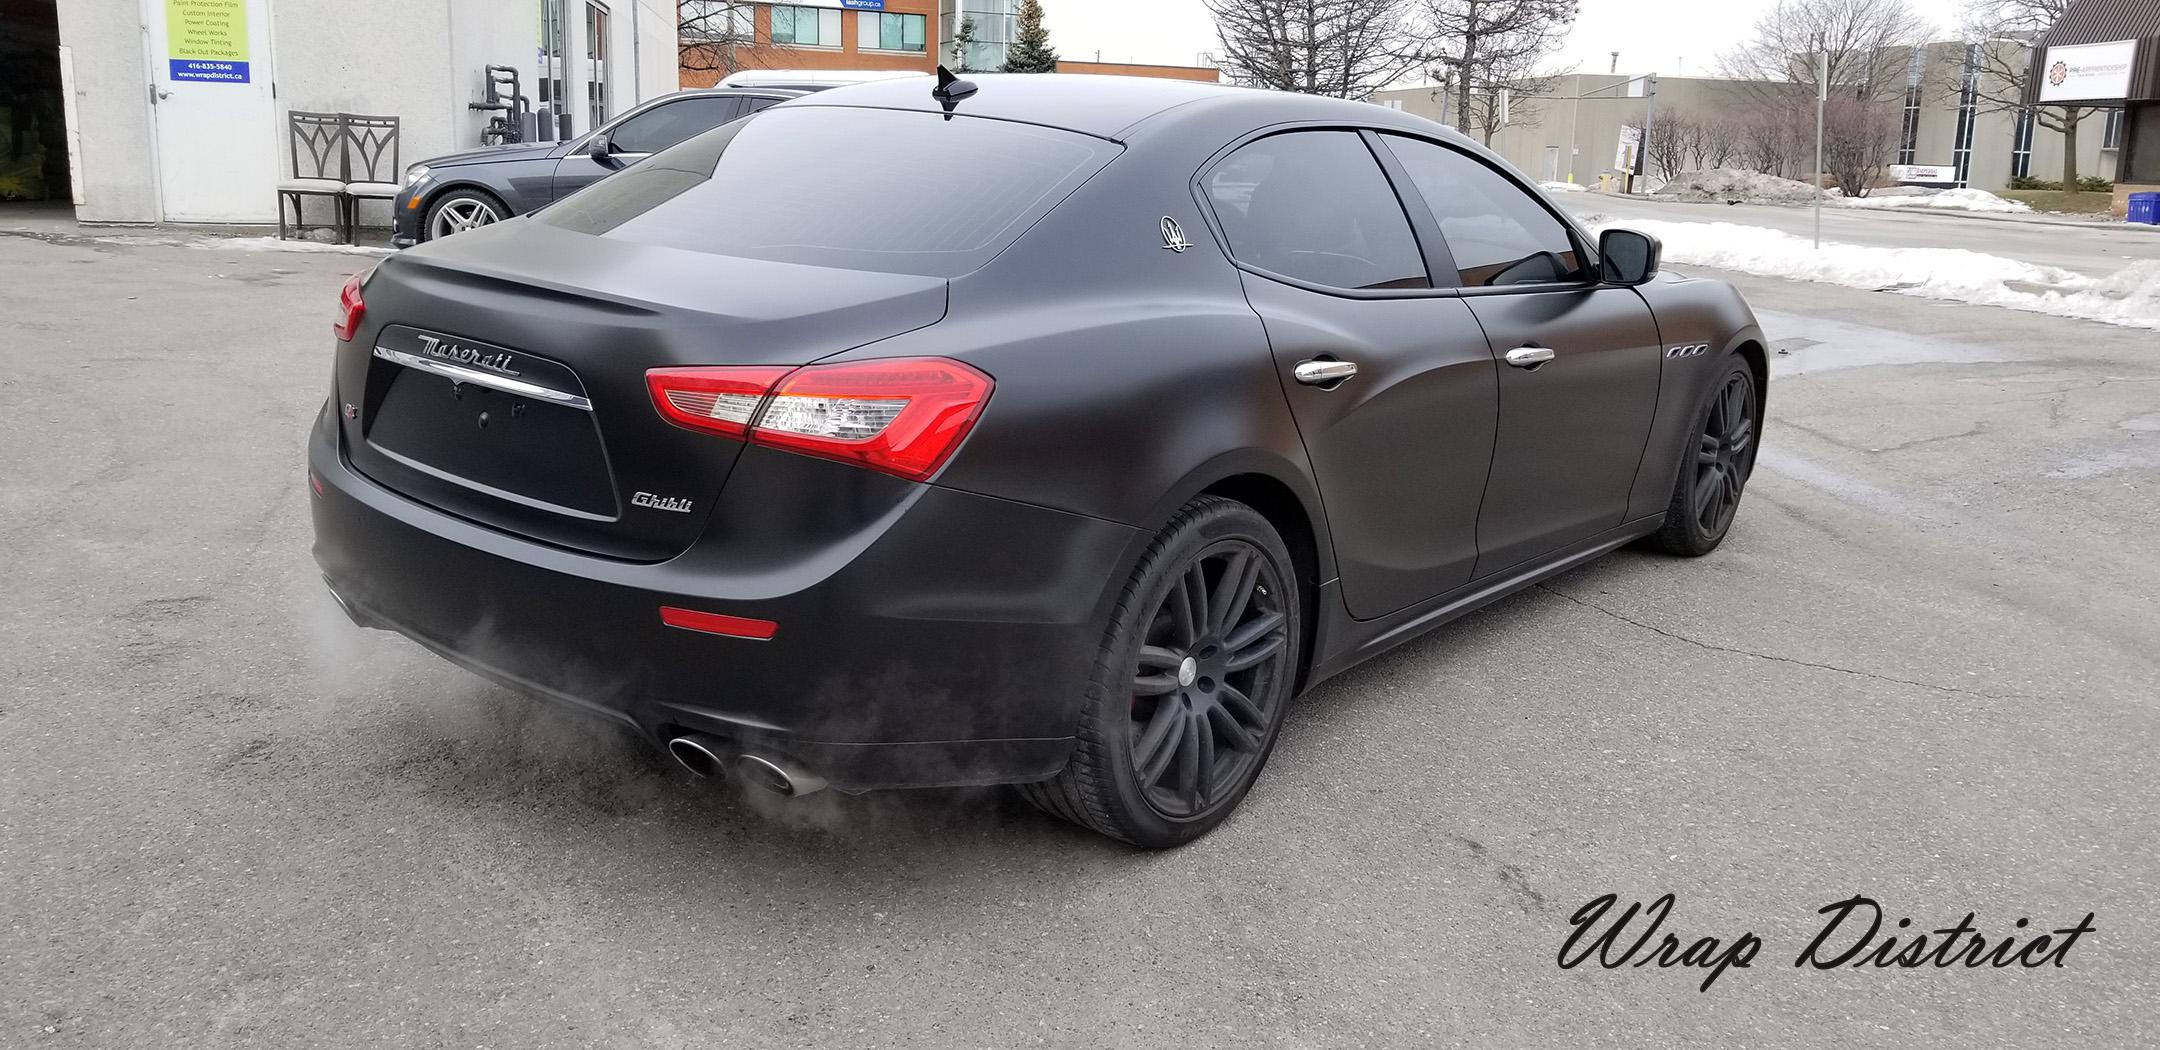 Maserati Ghibli Wrapped In Satin Black Wrap District